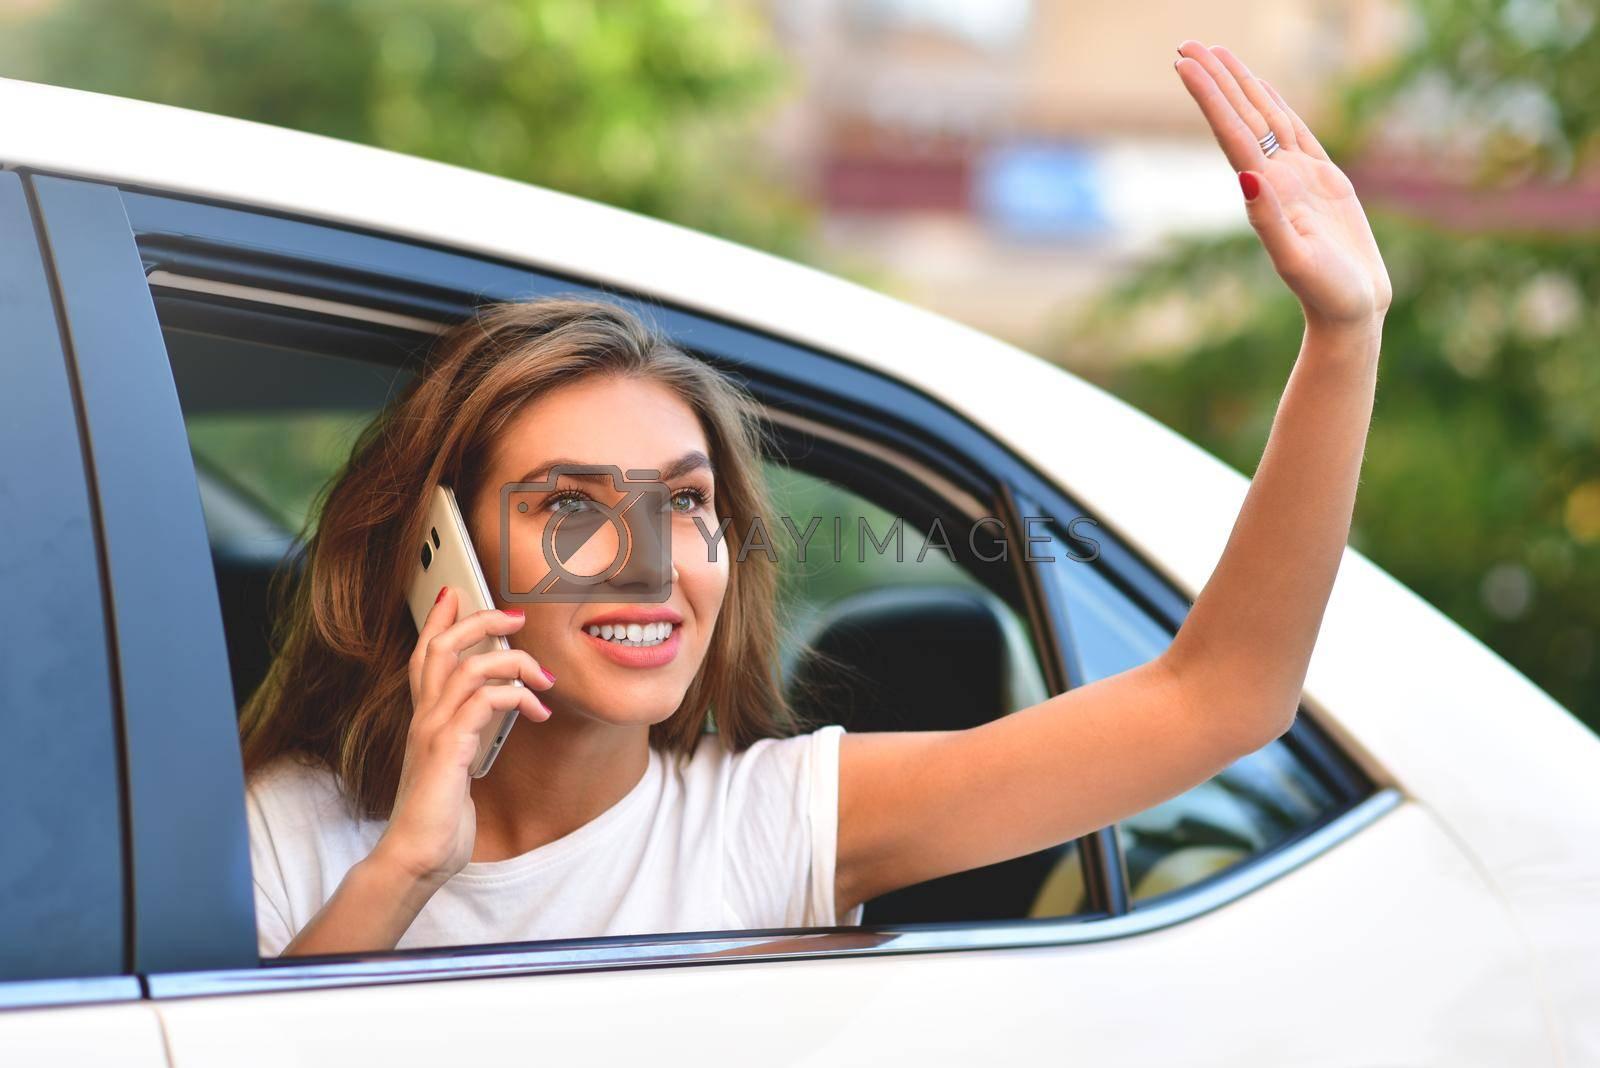 Woman peeking out of car window, woman peeking out of window and waving her hand by Nickstock